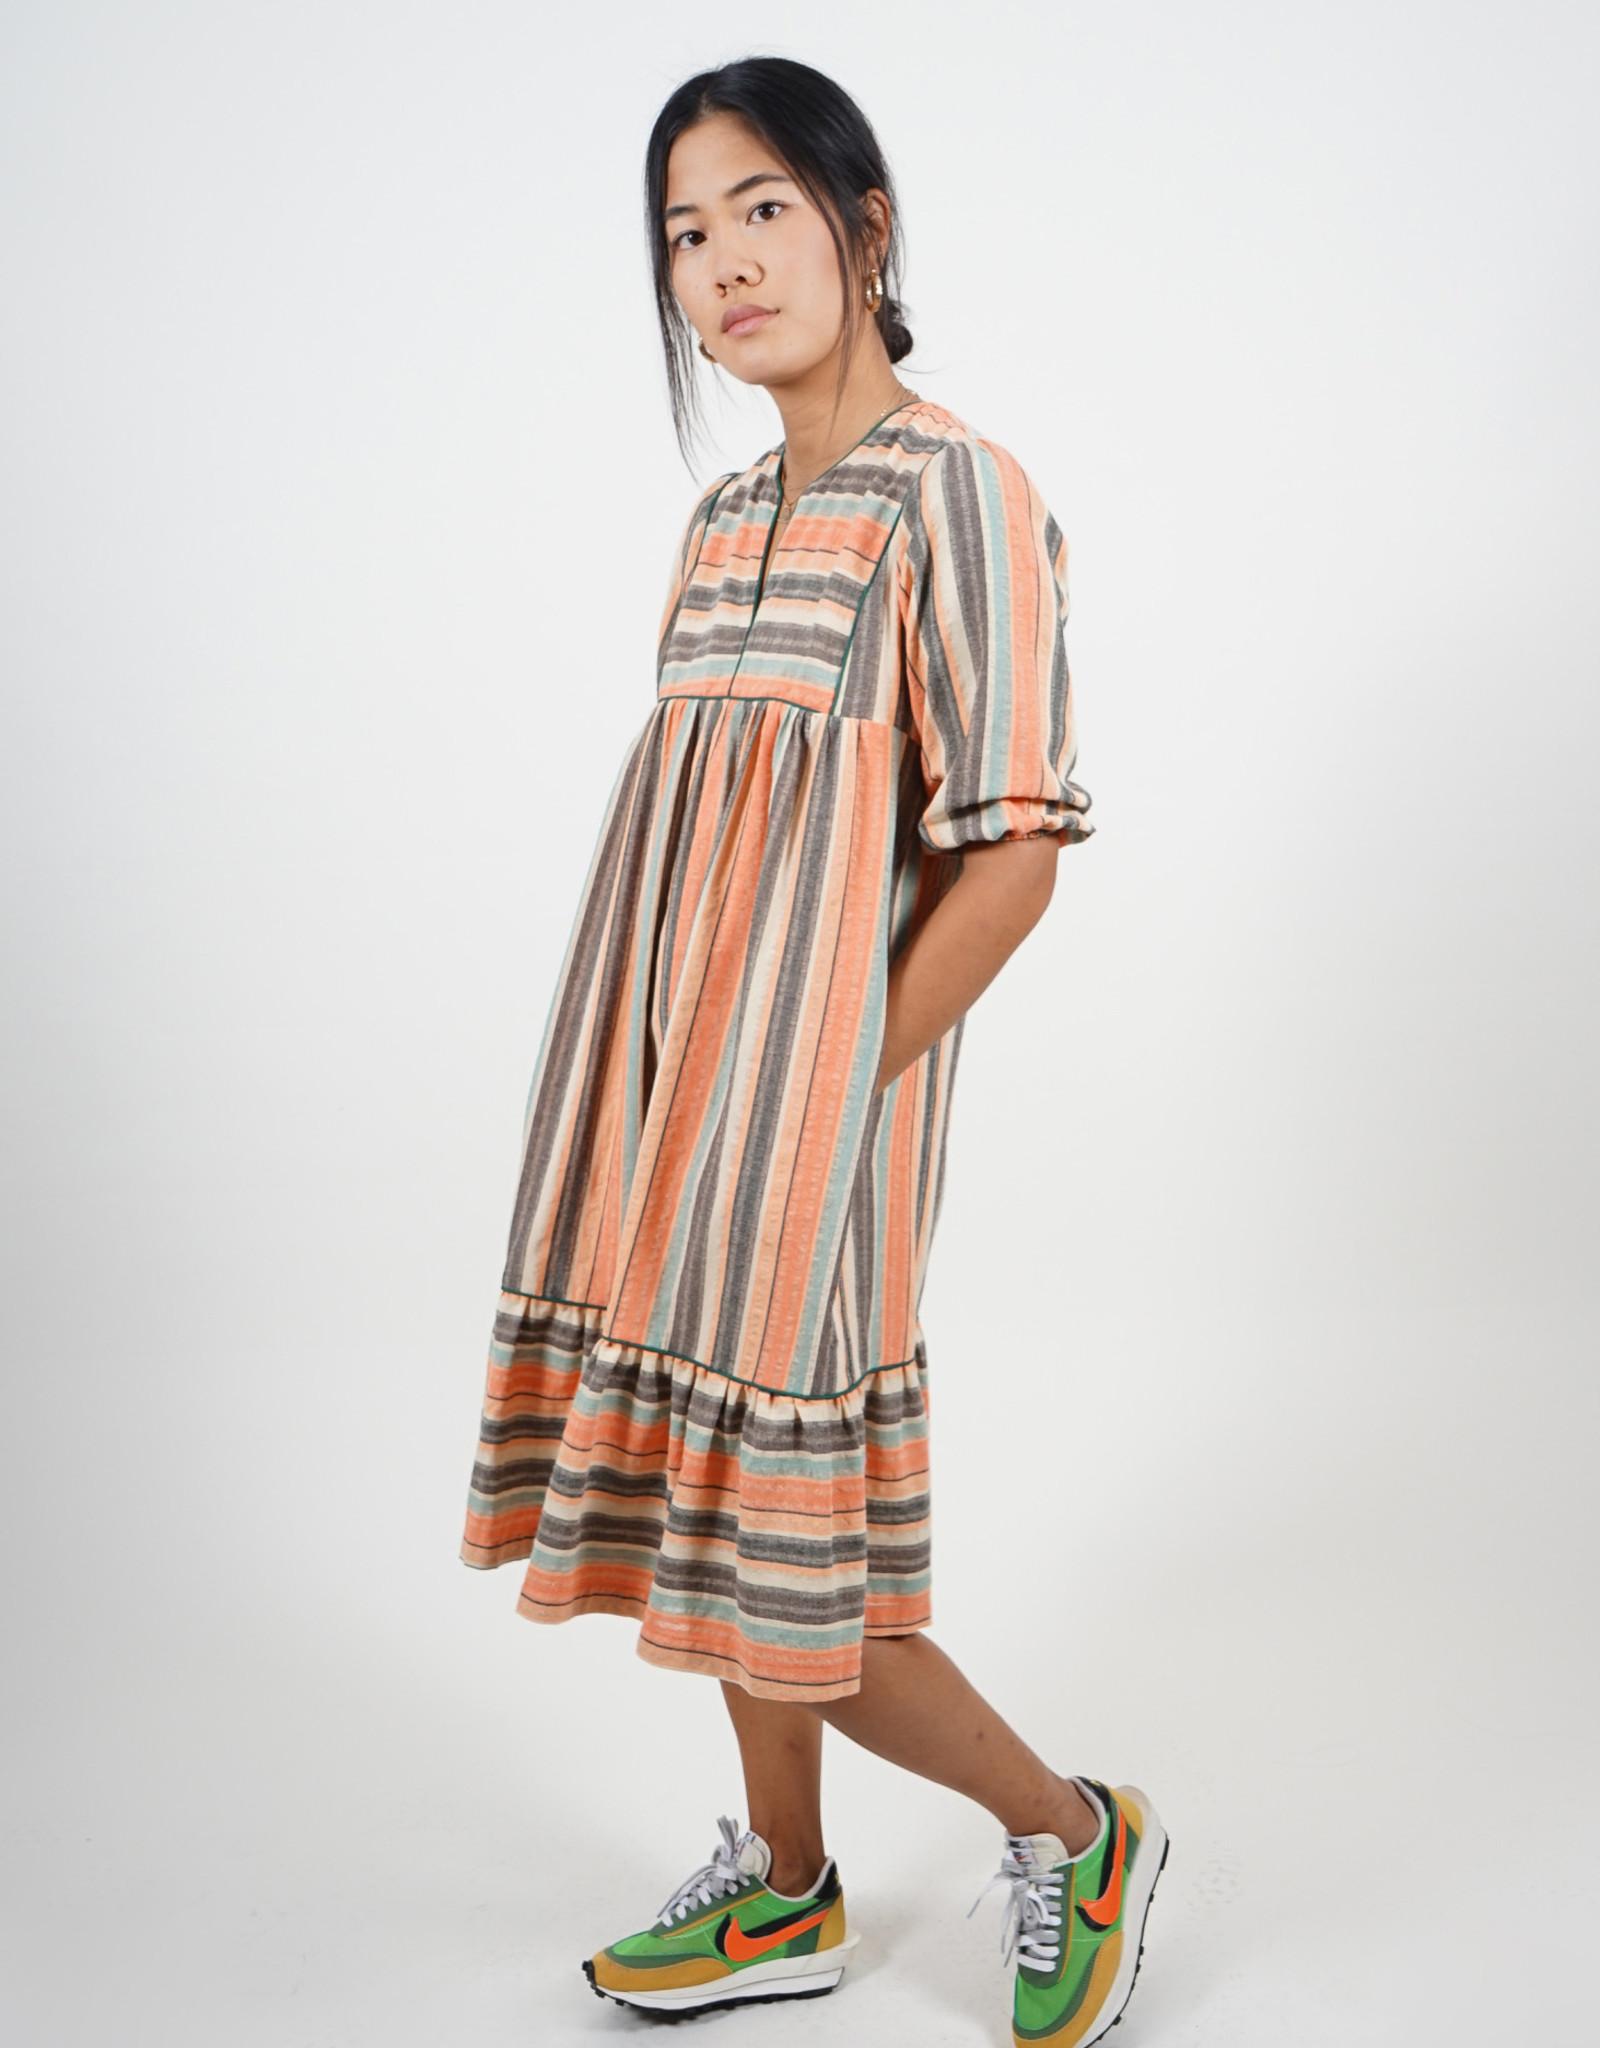 pollyjean dress rdsp21